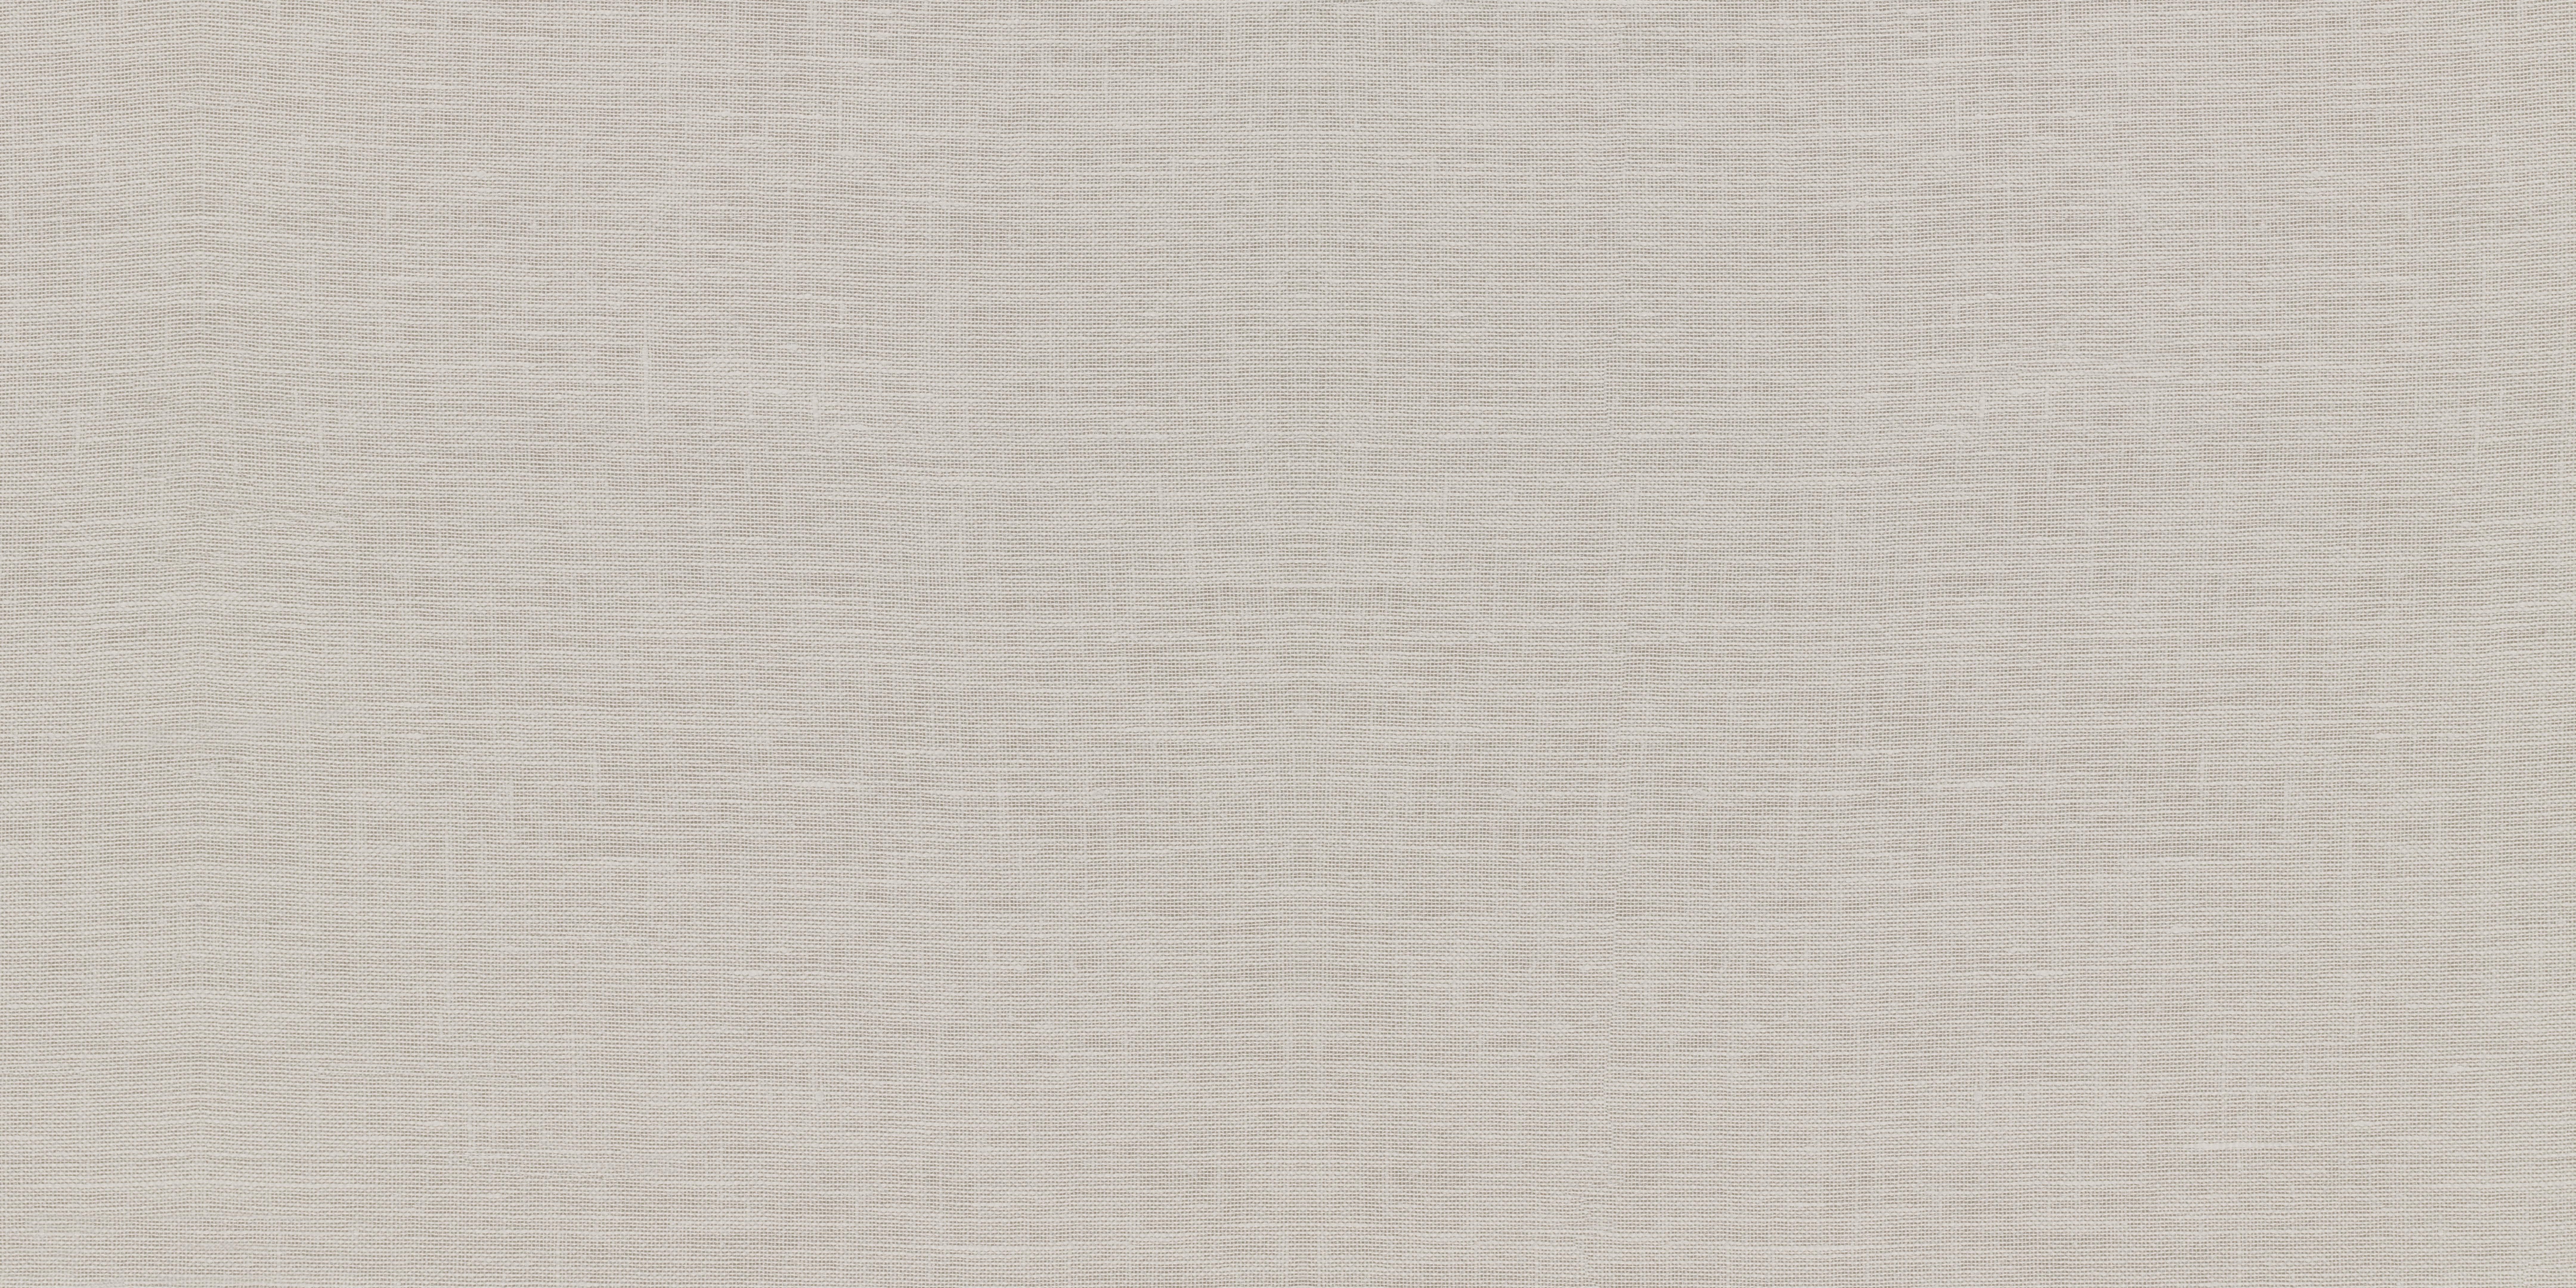 Ramie Fabric Dawn Mist 12x24